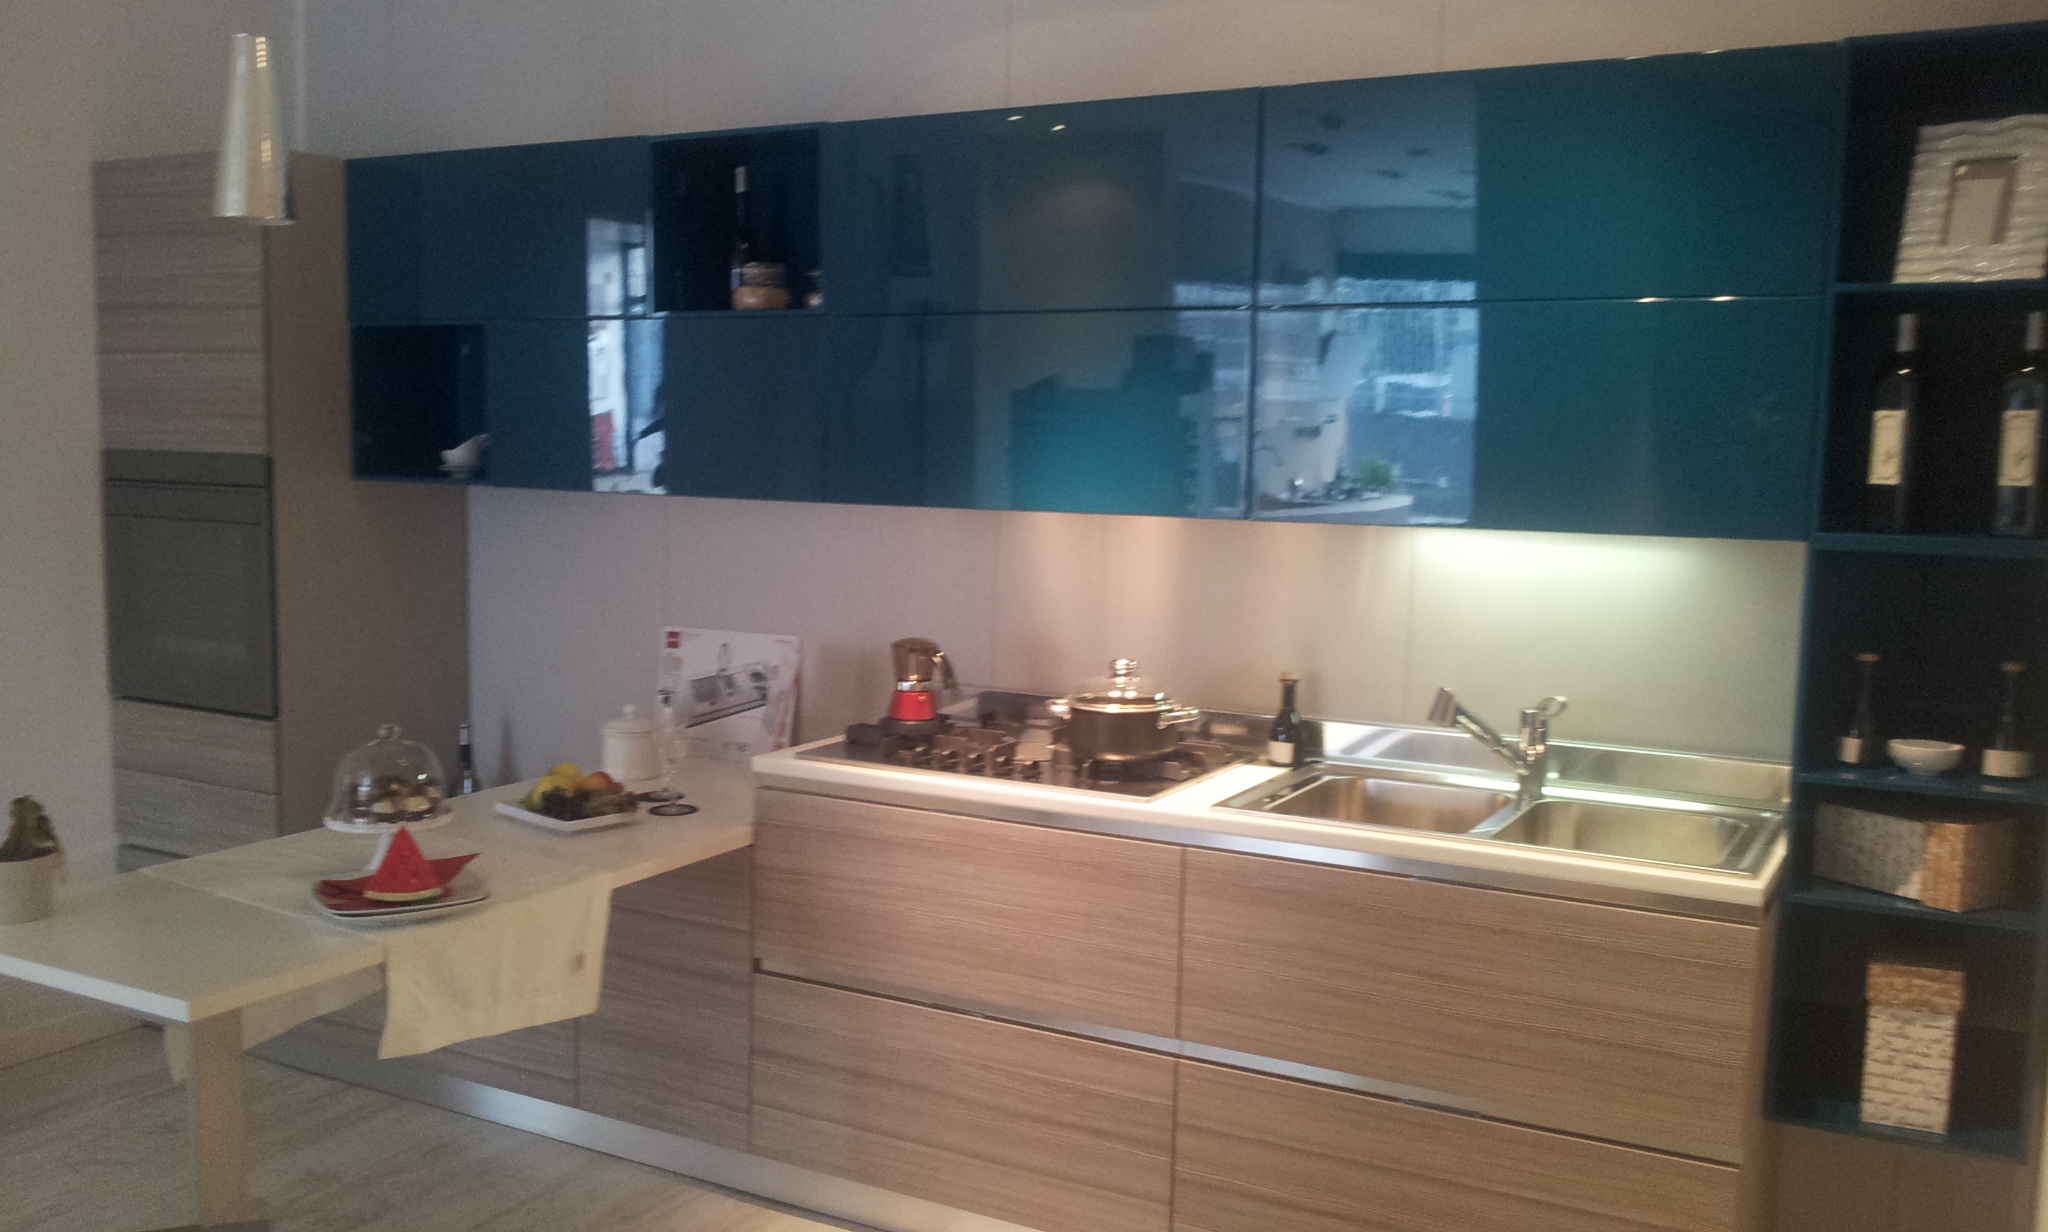 Emejing Cucina Larice Grigio Ideas - bery.us - bery.us